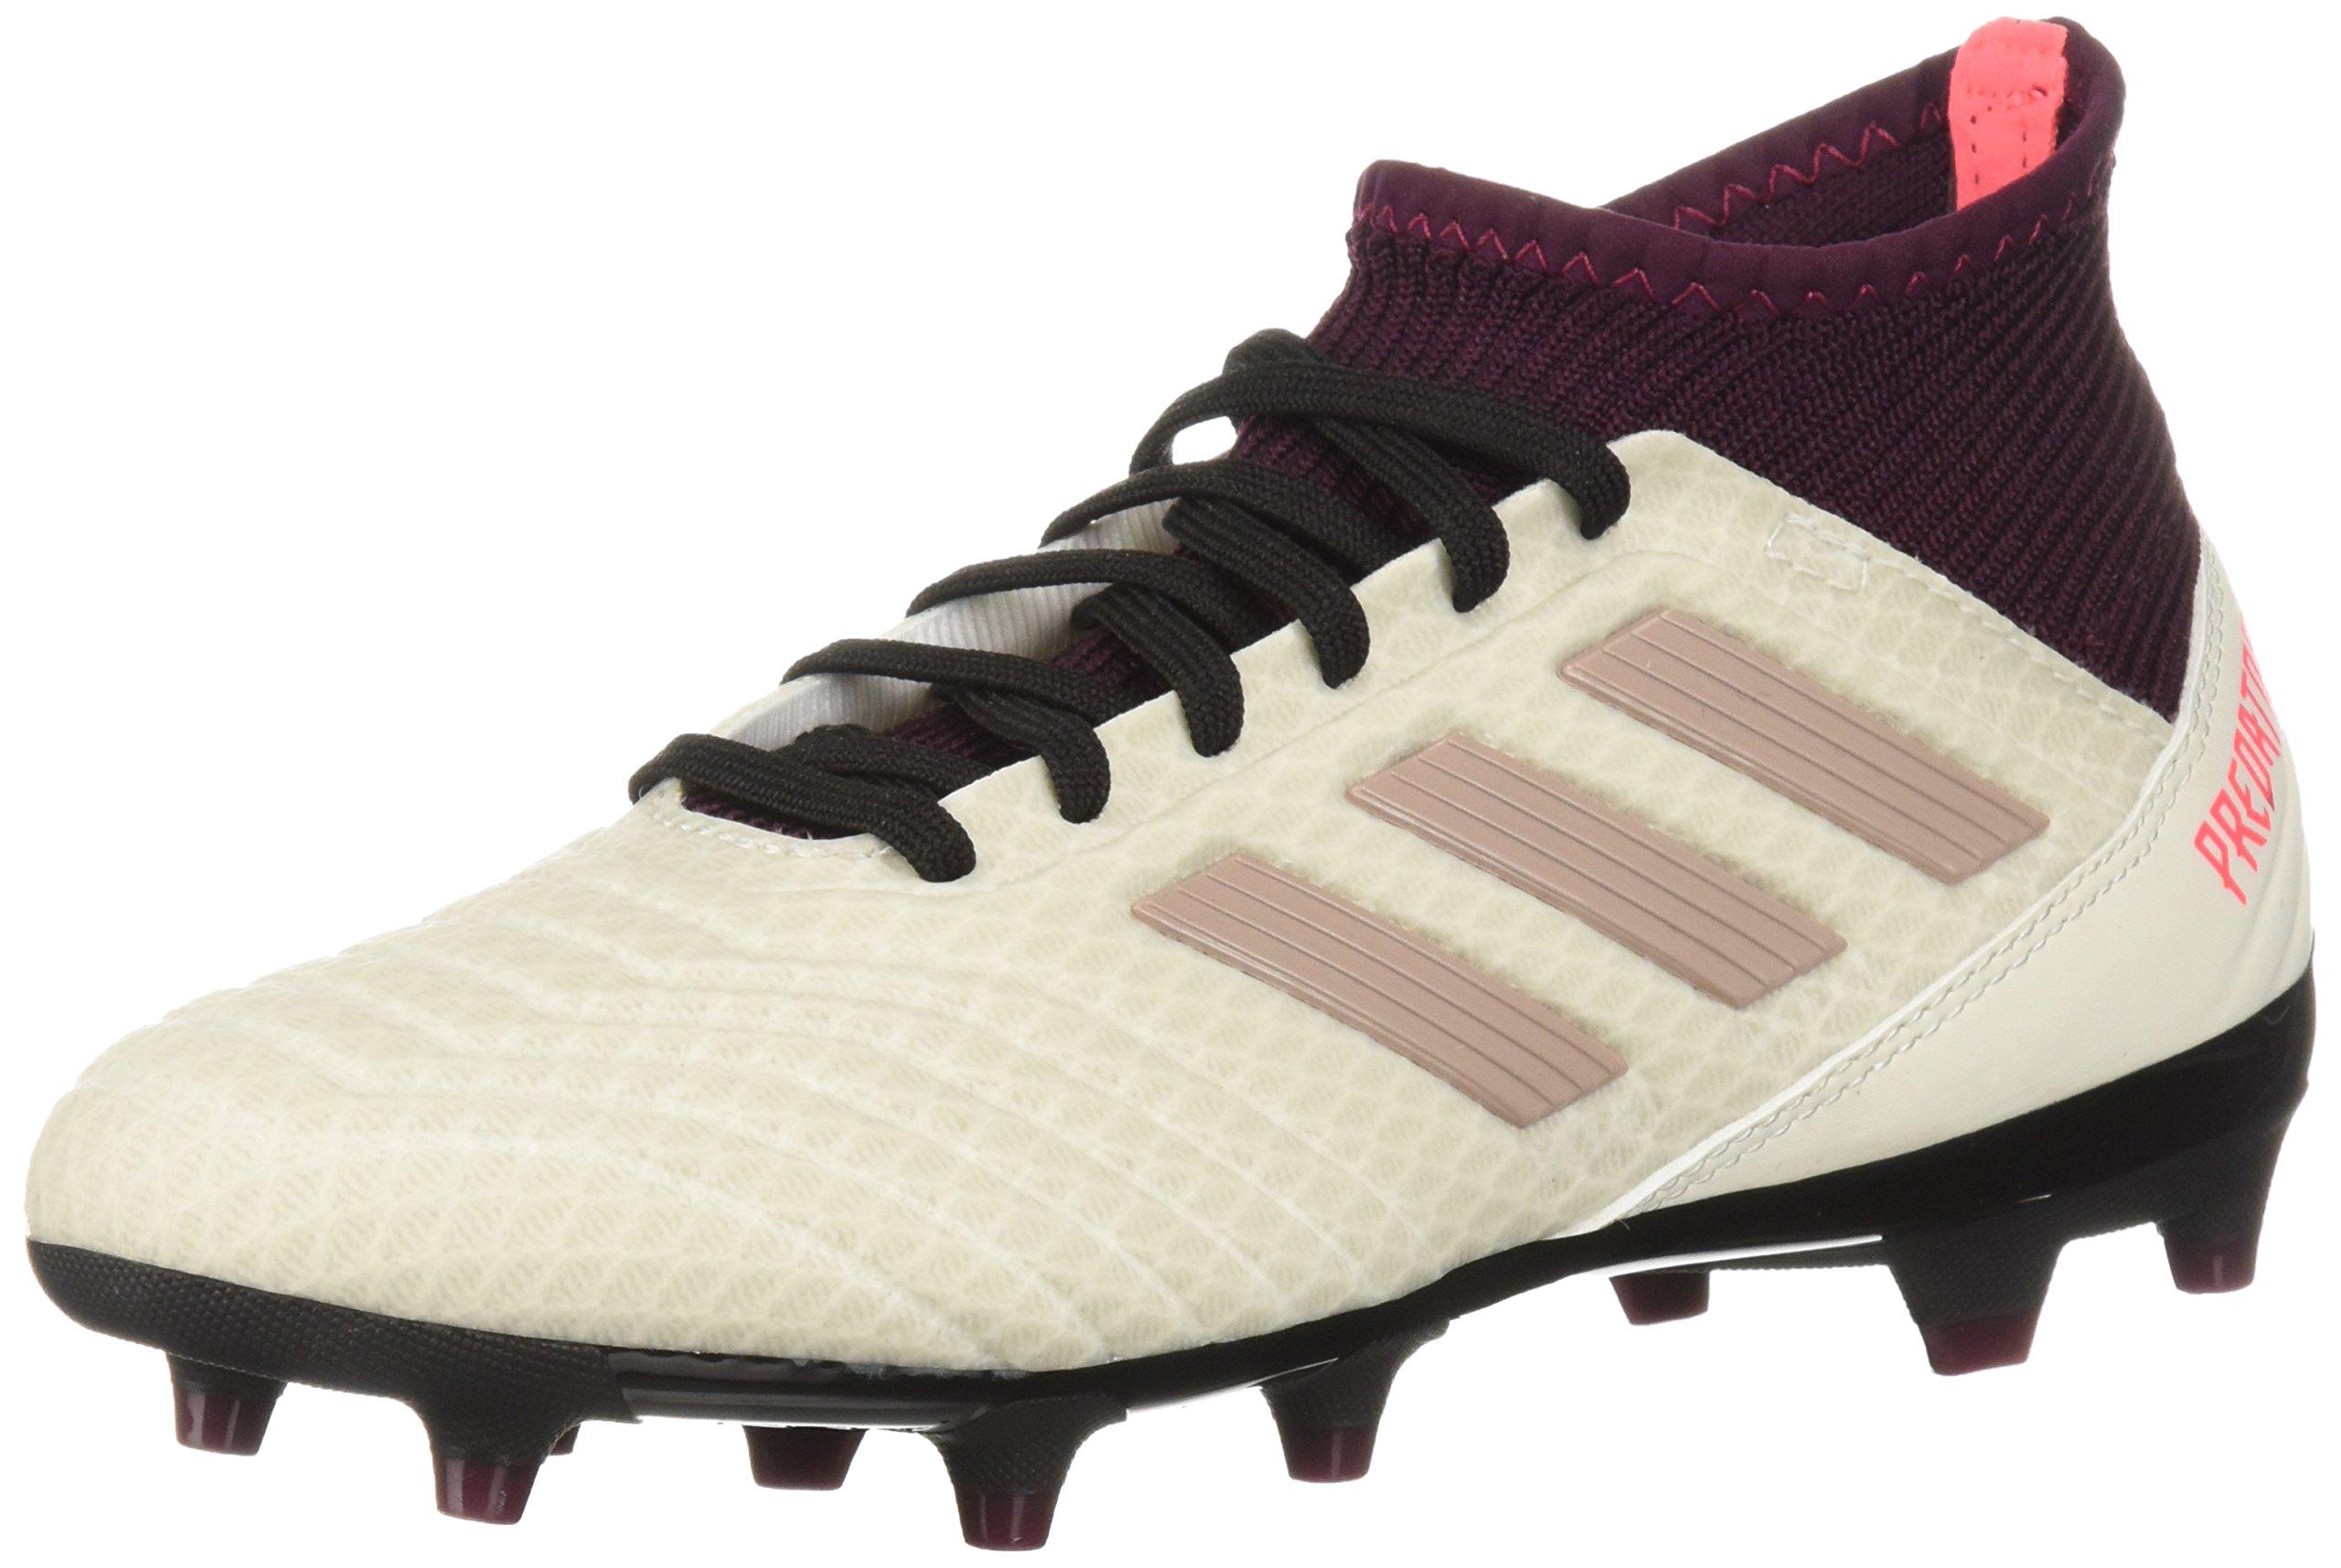 adidas Women's Predator 18.3 Firm Ground Soccer Shoe Talc/Vapour Grey/Maroon 5 M